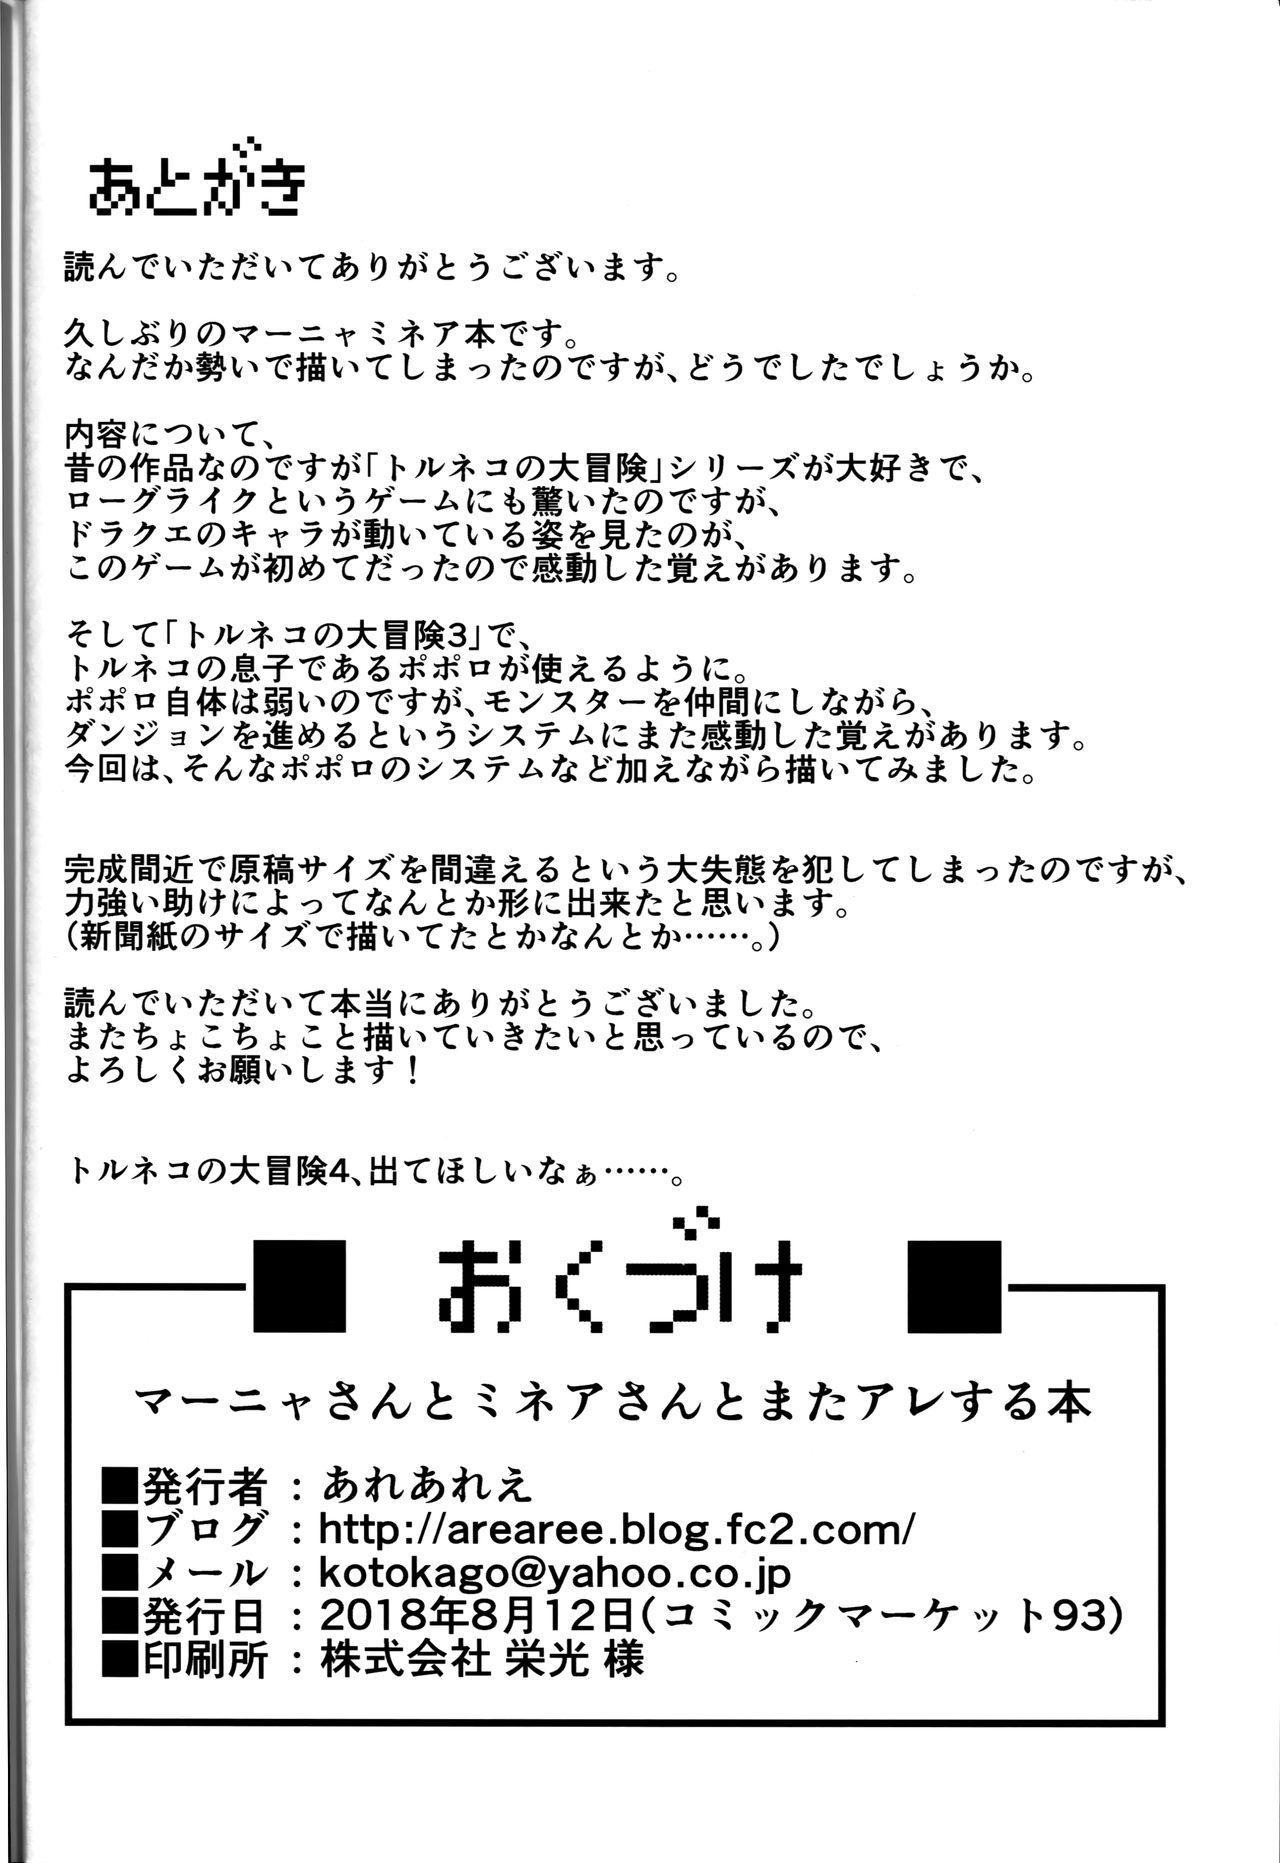 (C94) [Arearee] Manya-san to Minea-san to Mata Are Suru Hon (Dragon Quest IV) 20